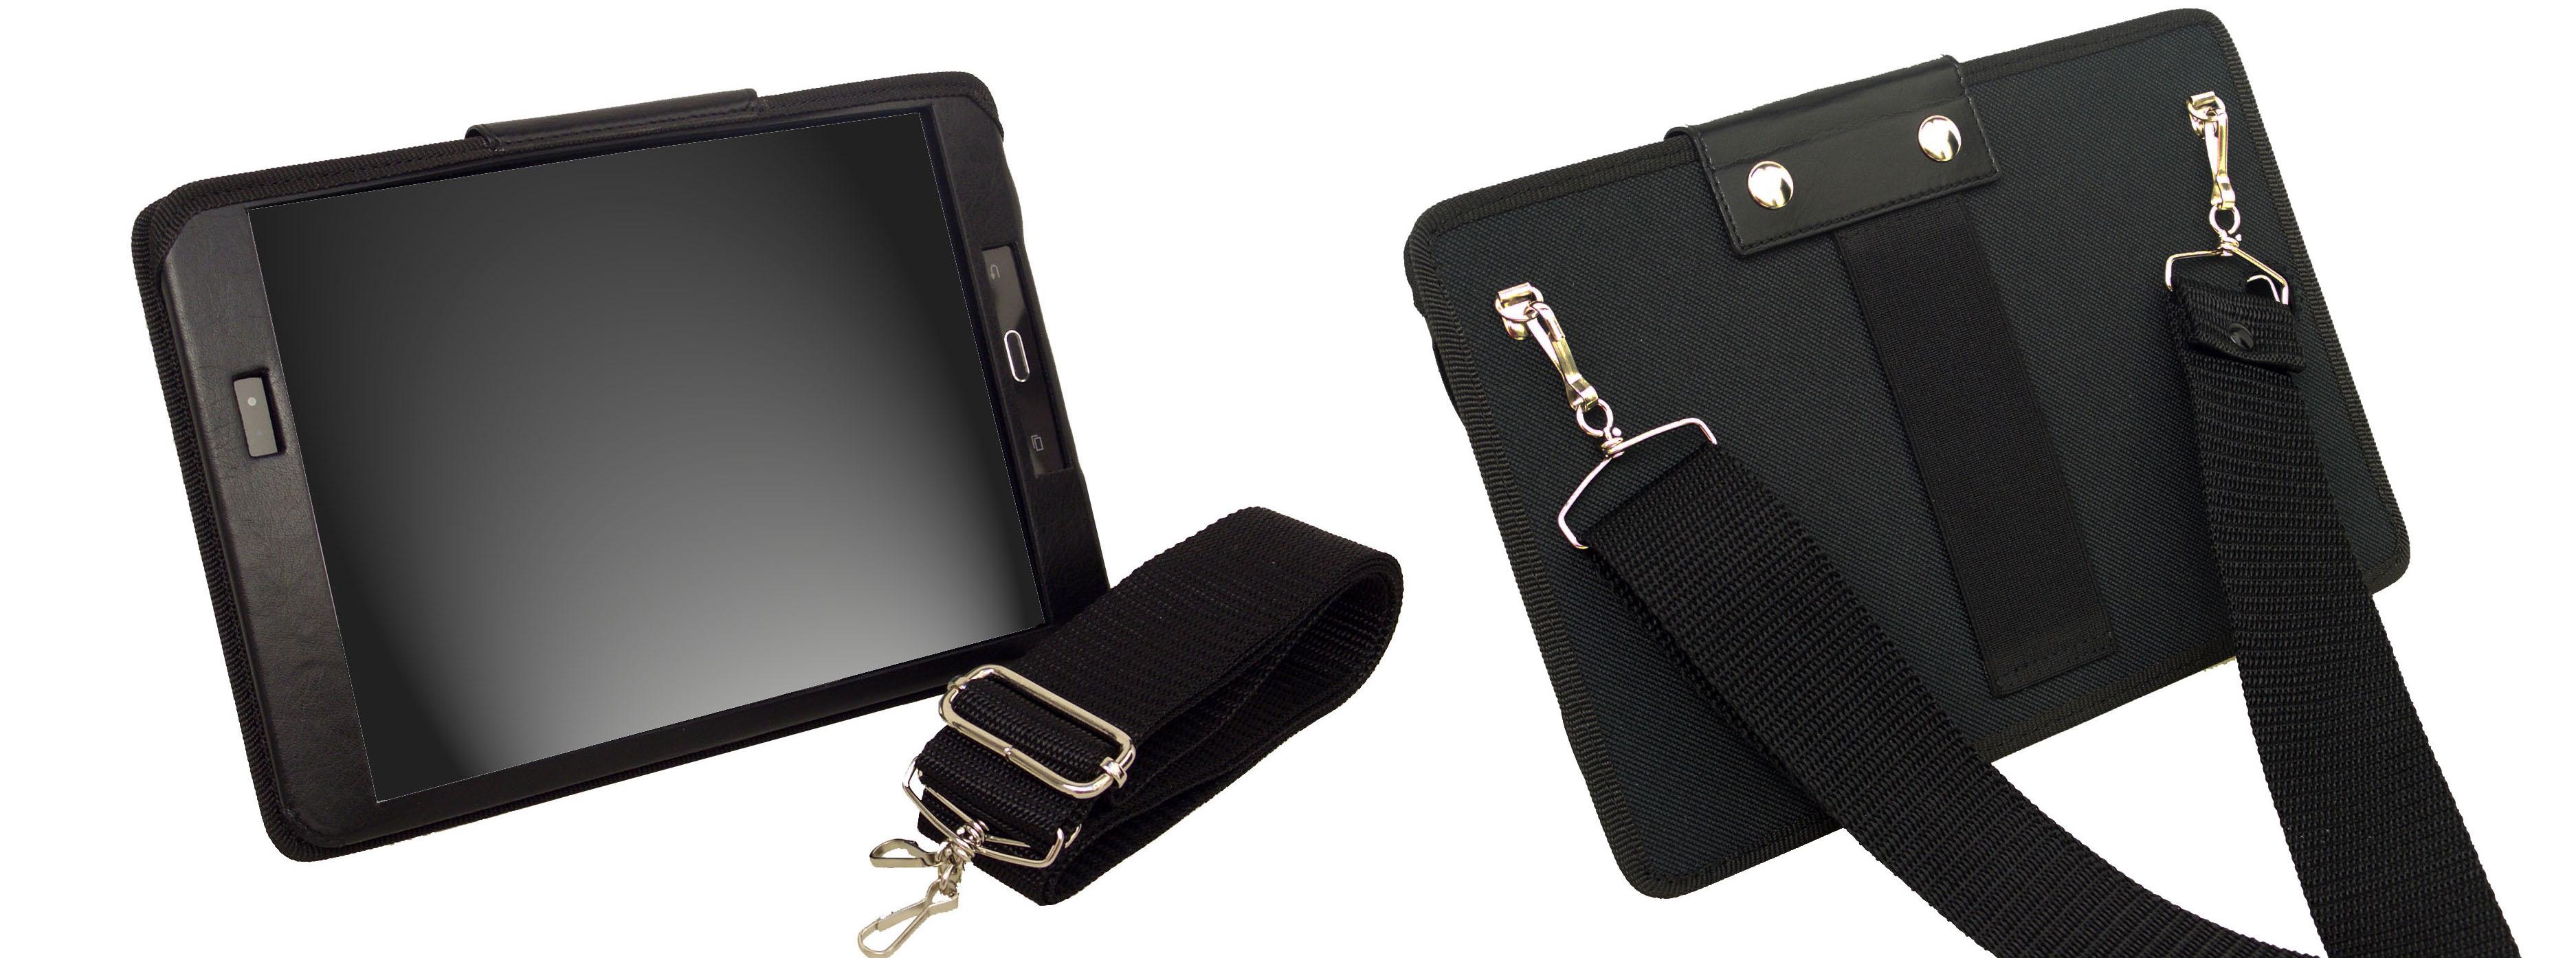 samsung galaxy tab a tablet case melgar news